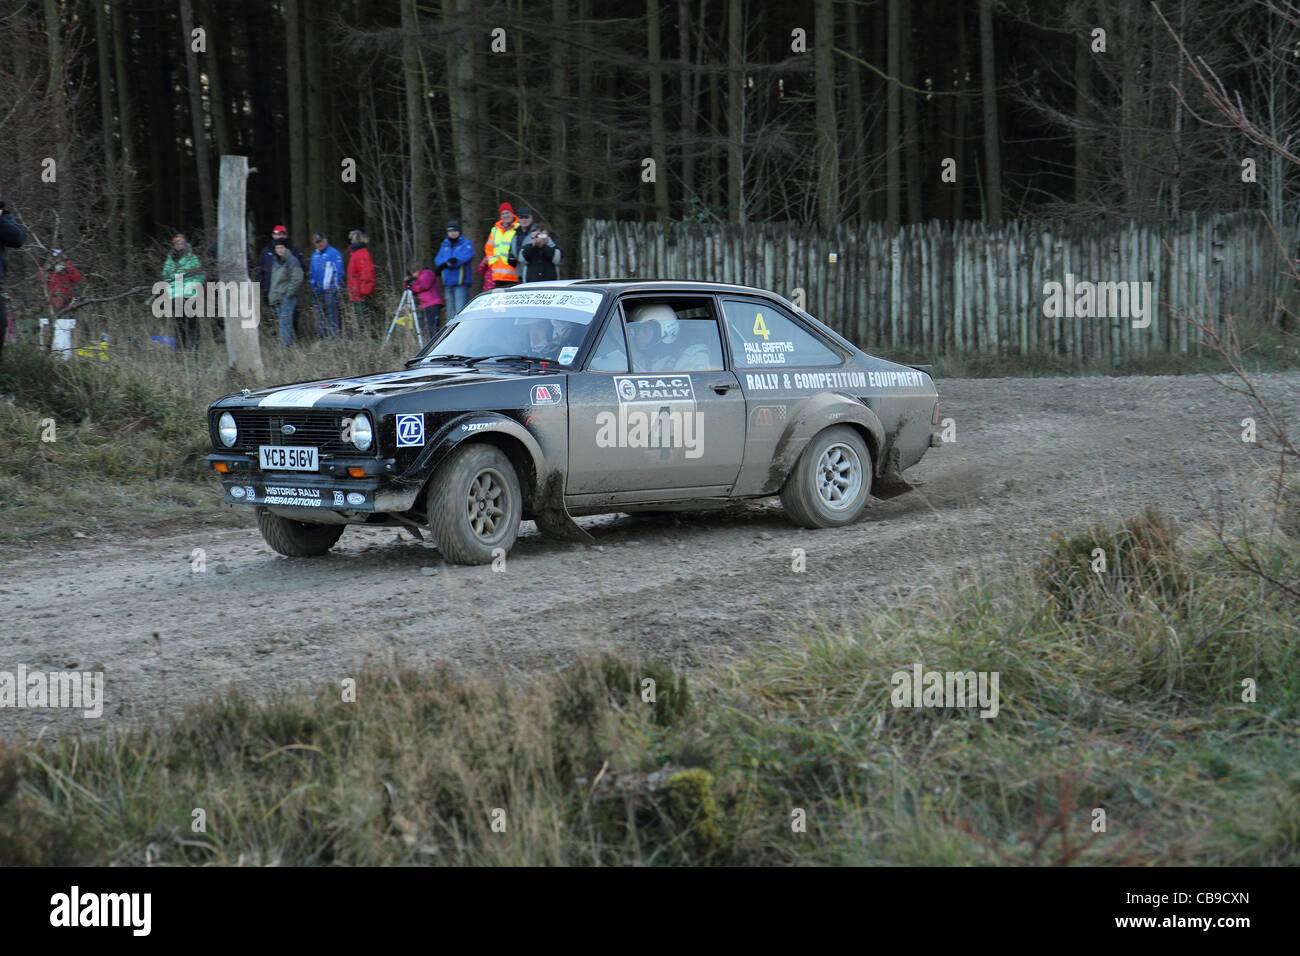 rally motor sport cars - Stock Image